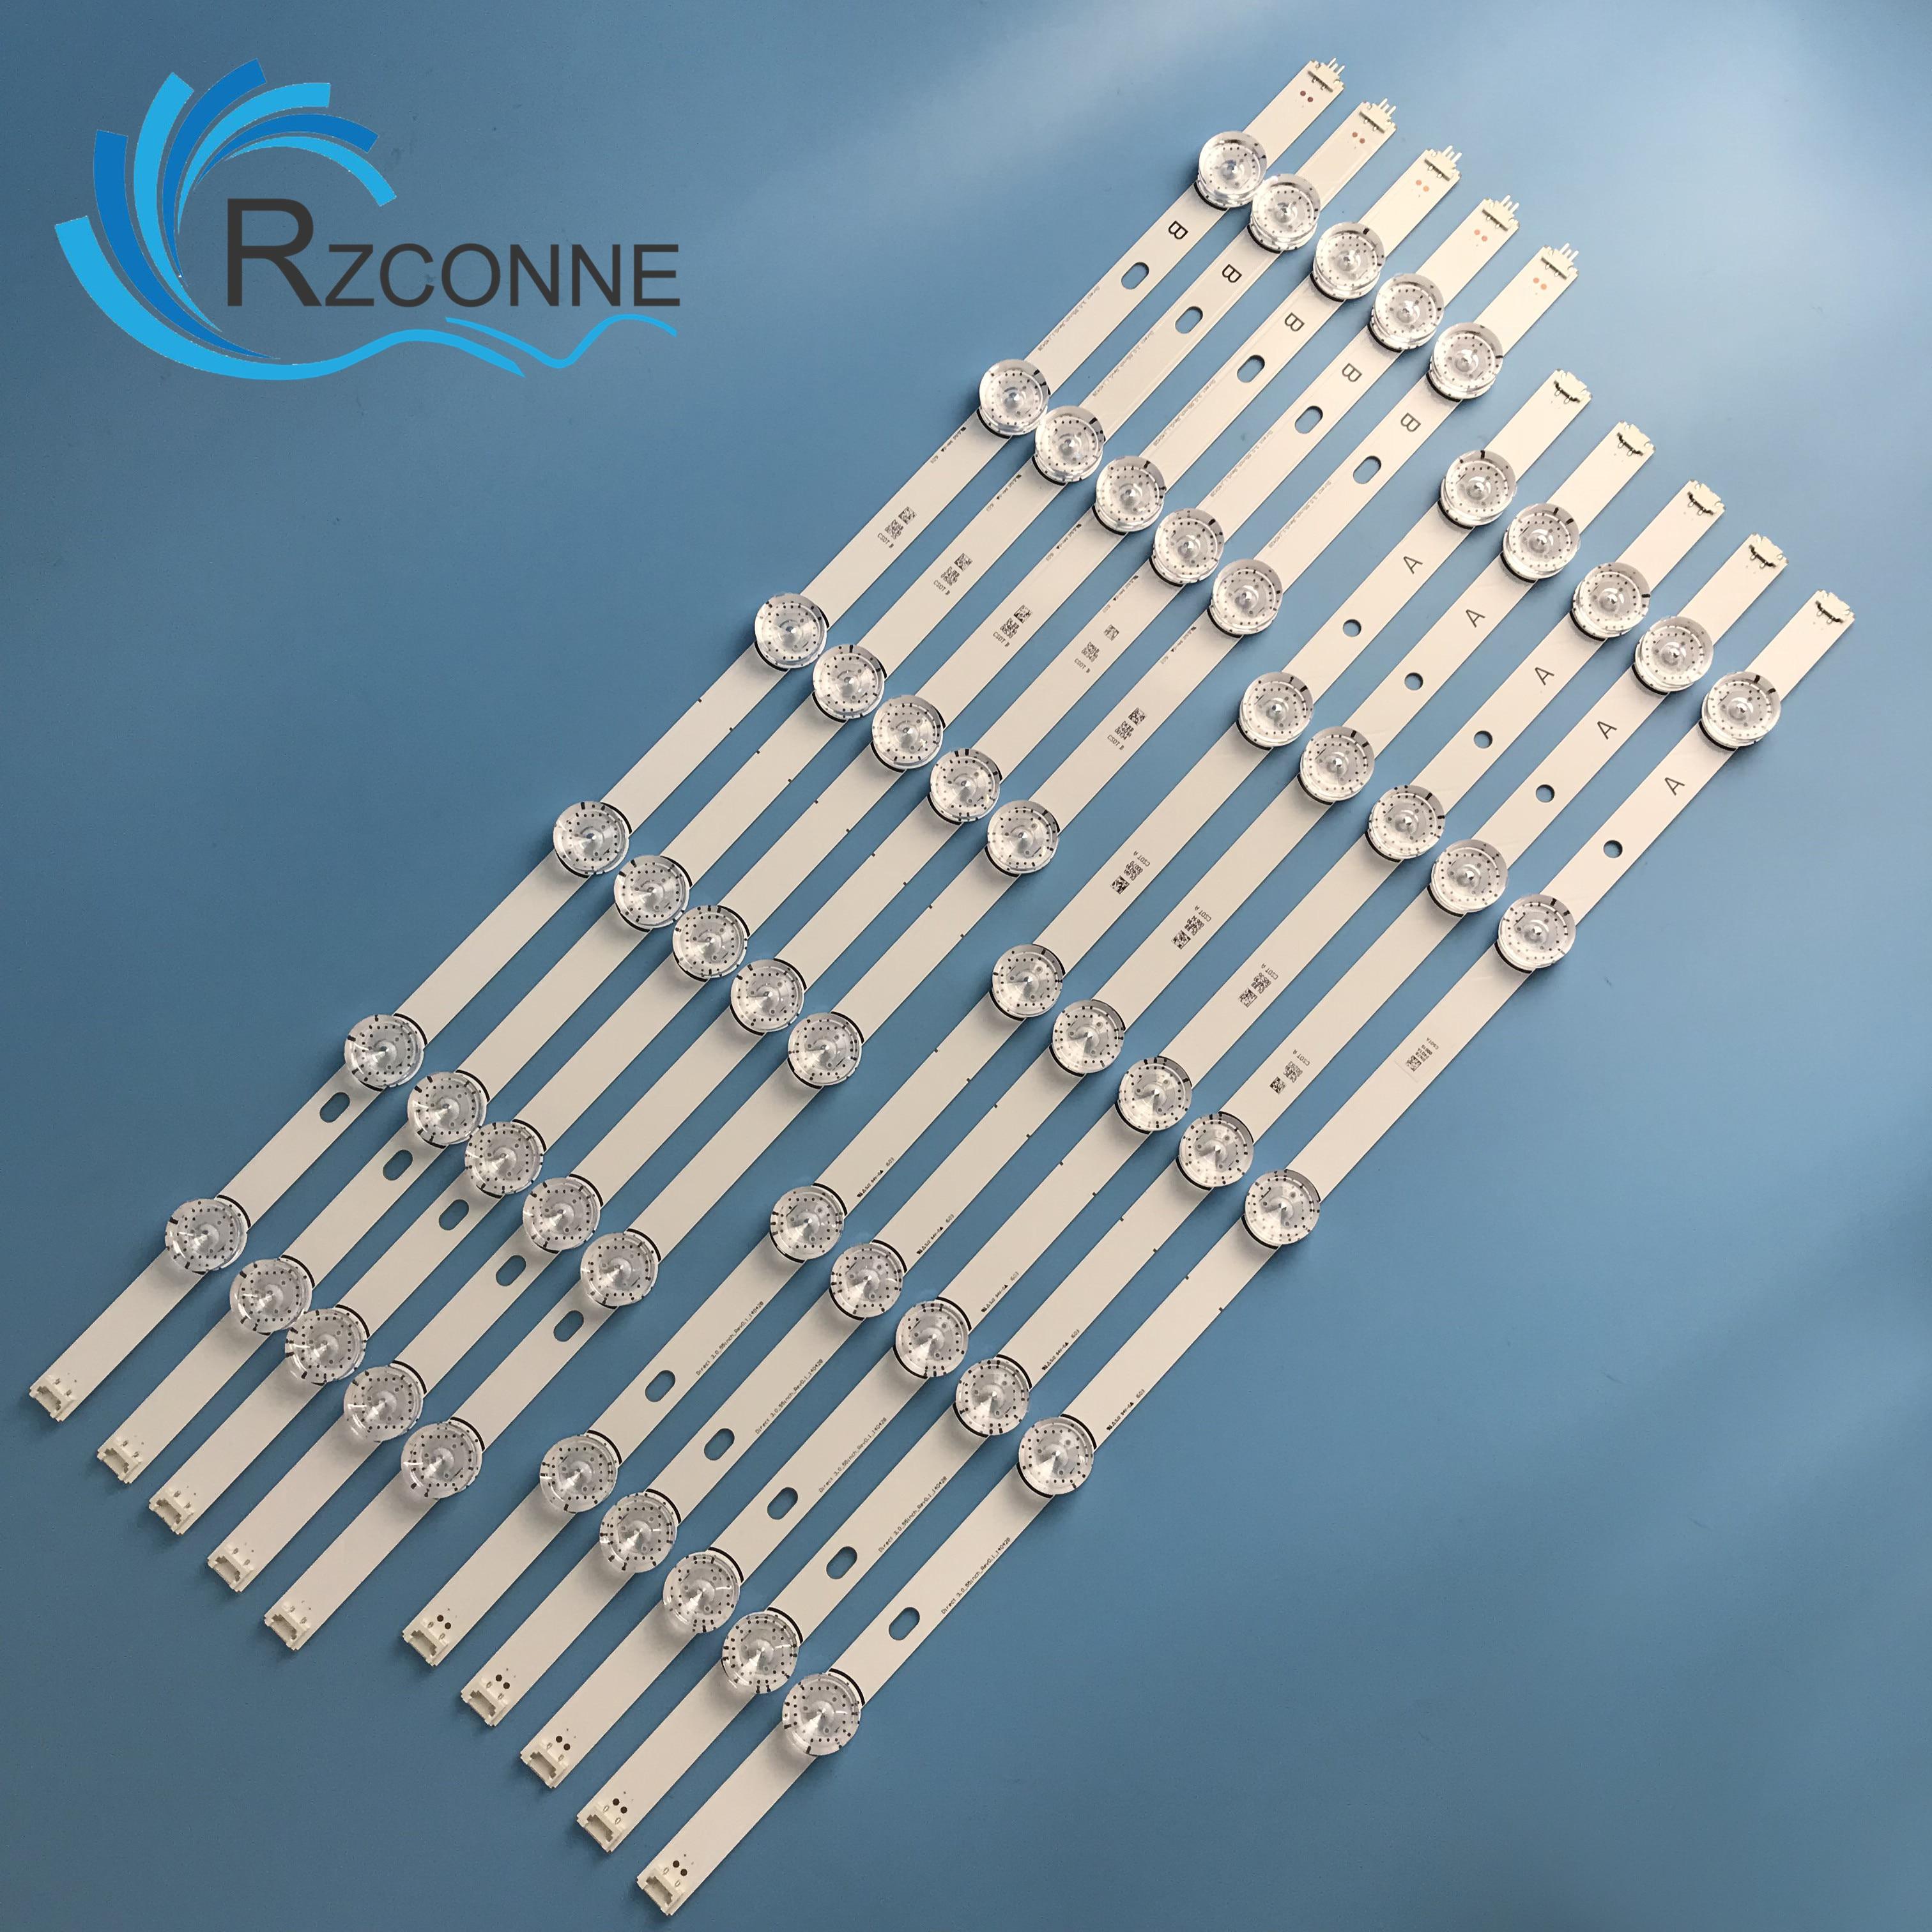 LED Backlight Strip For Innotek DRT 3.0 55 55LB561V LG55LF5950 6916L 1730A 1731 1833A 1834A 1989A 1990A 1991A 1992A 2232A 2233A